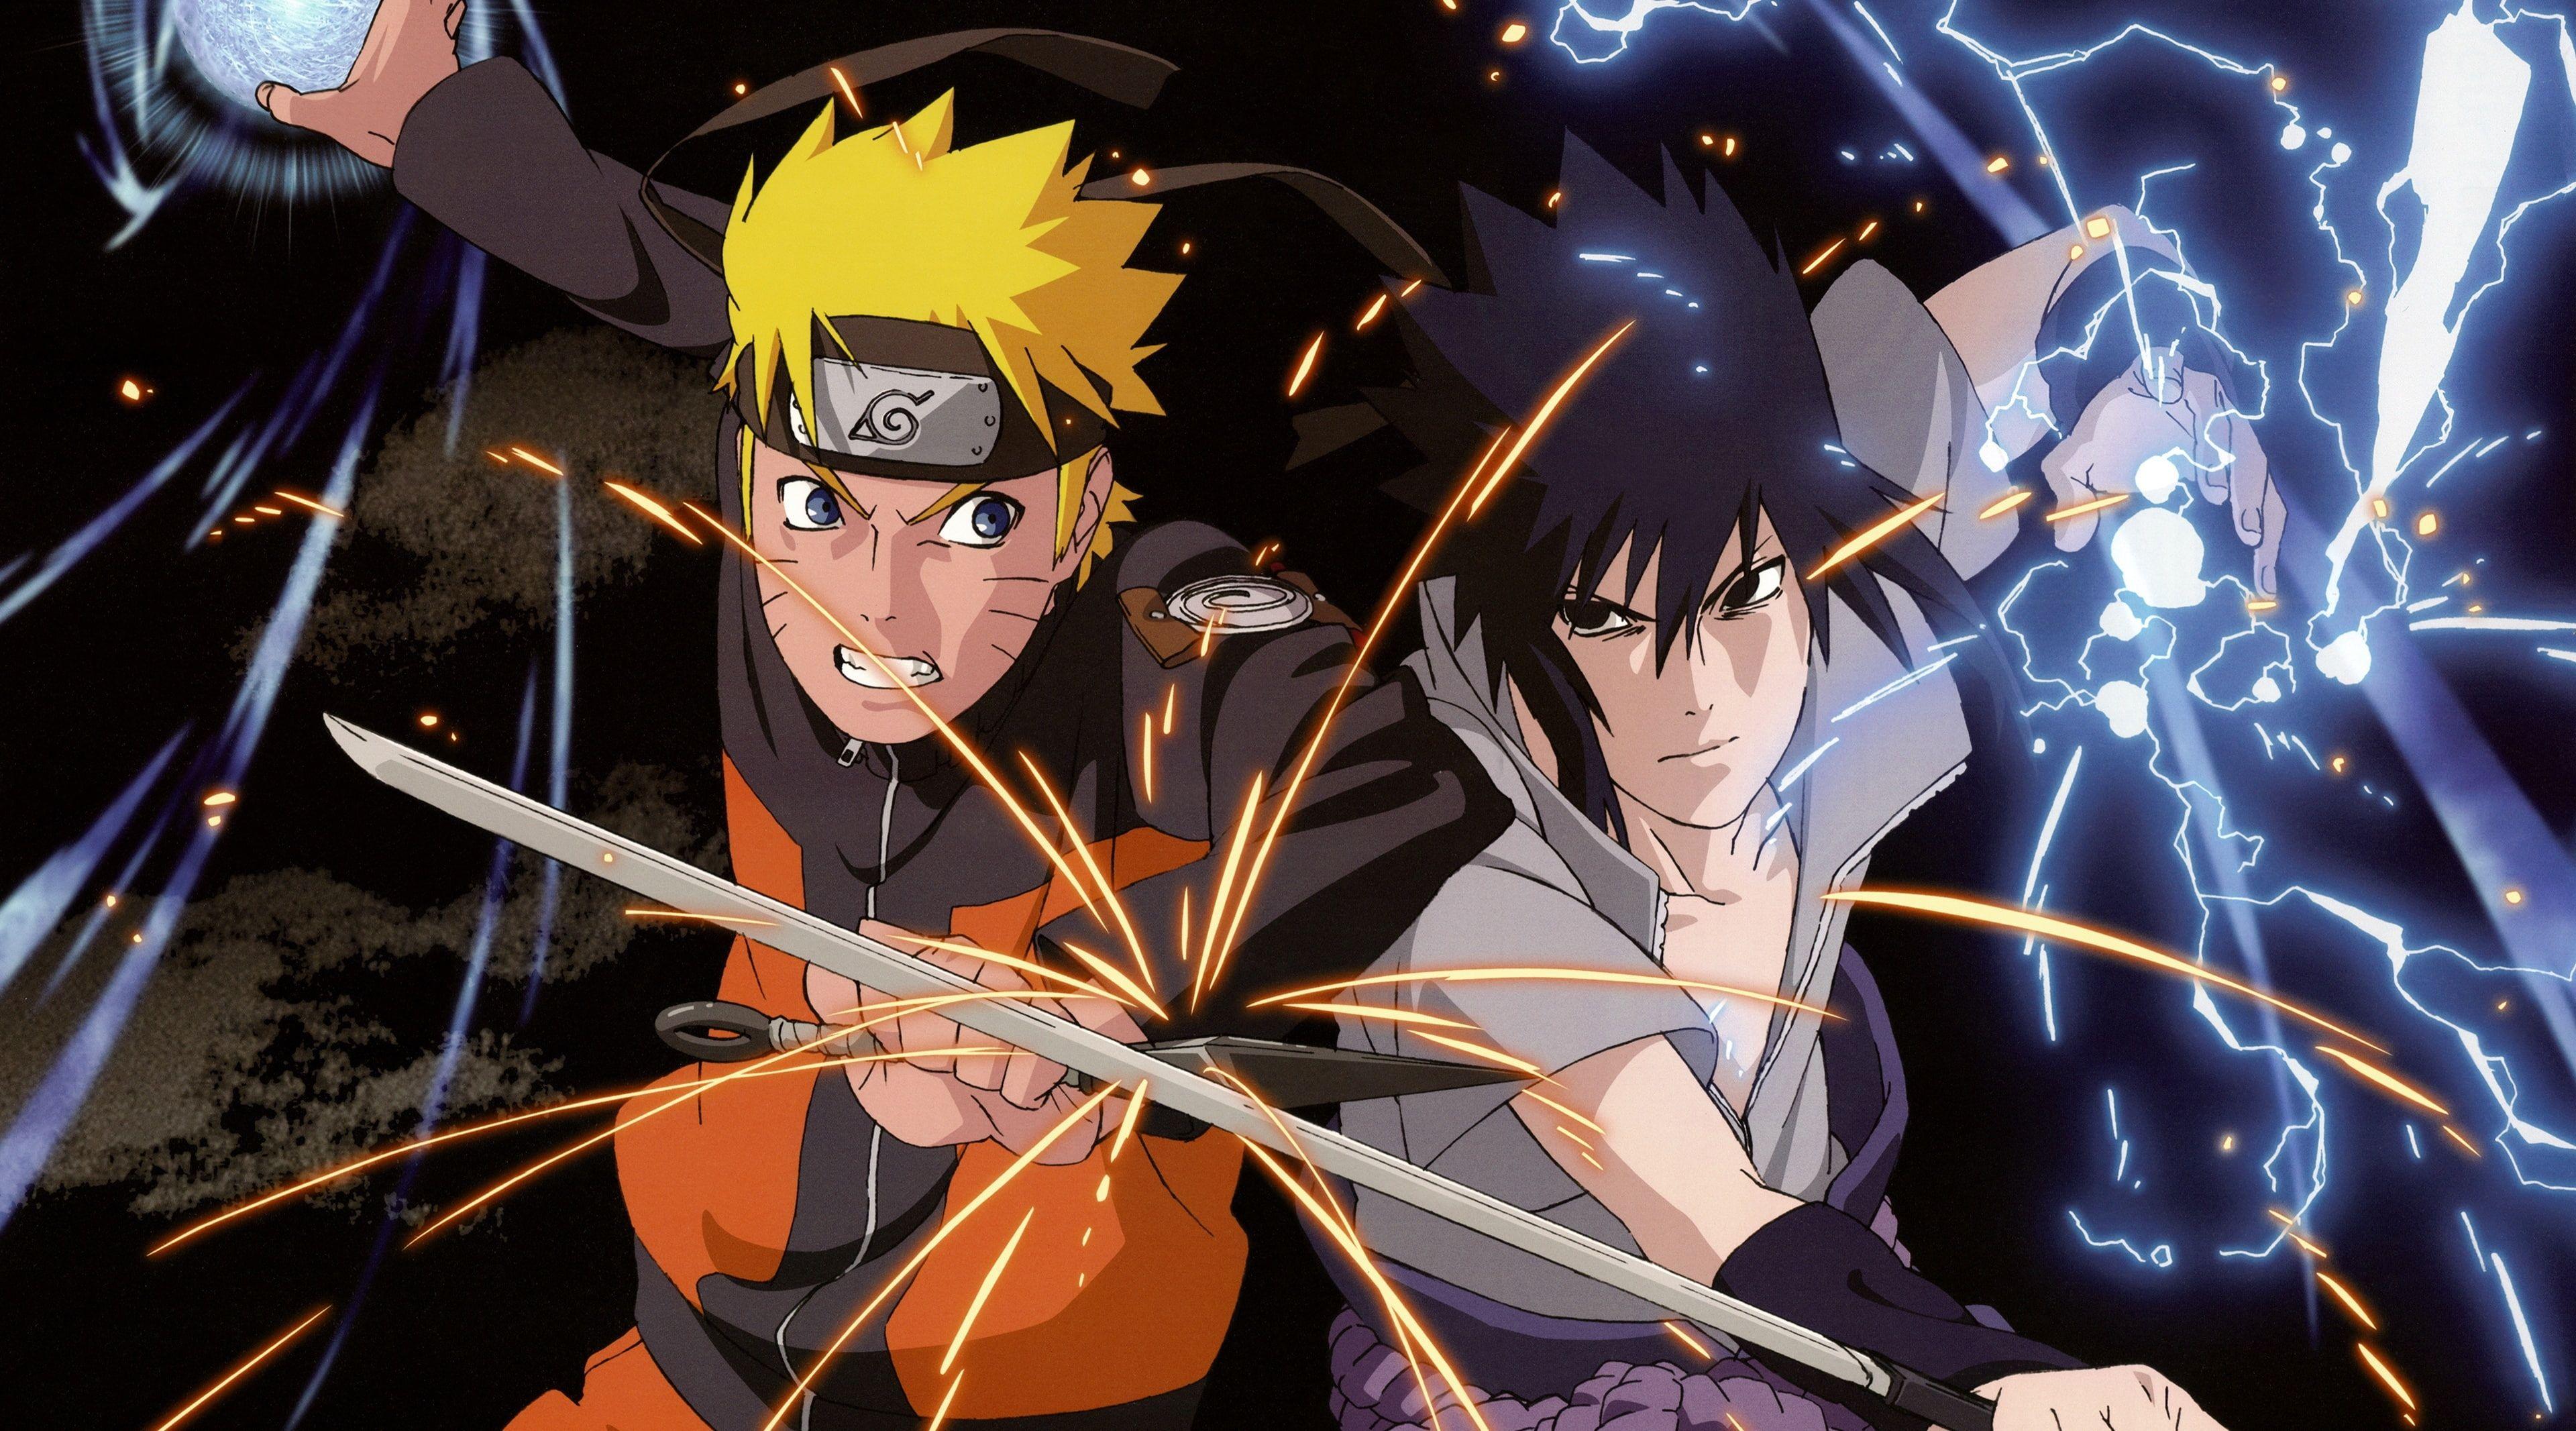 Naruto Vs Sasuke Uzumaki Naruto And Uchiha Sasuke Digital Wallpaper Artistic Anime Naruto N In 2021 Naruto And Sasuke Wallpaper Naruto And Sasuke Naruto Vs Sasuke